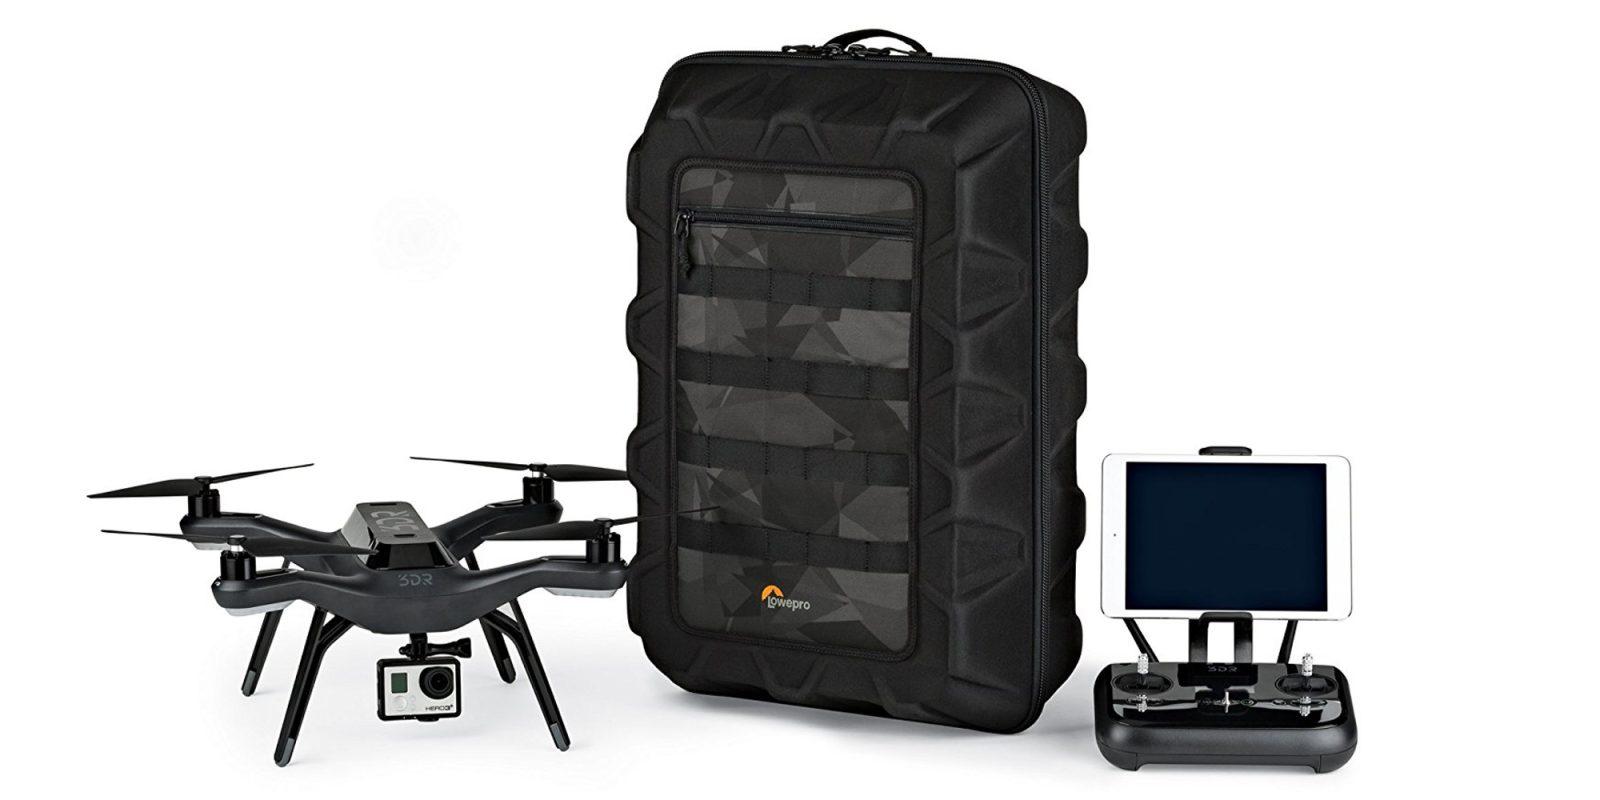 Lowepro DroneGuard CS 400 Backpack for $50 shipped (Reg. $100)